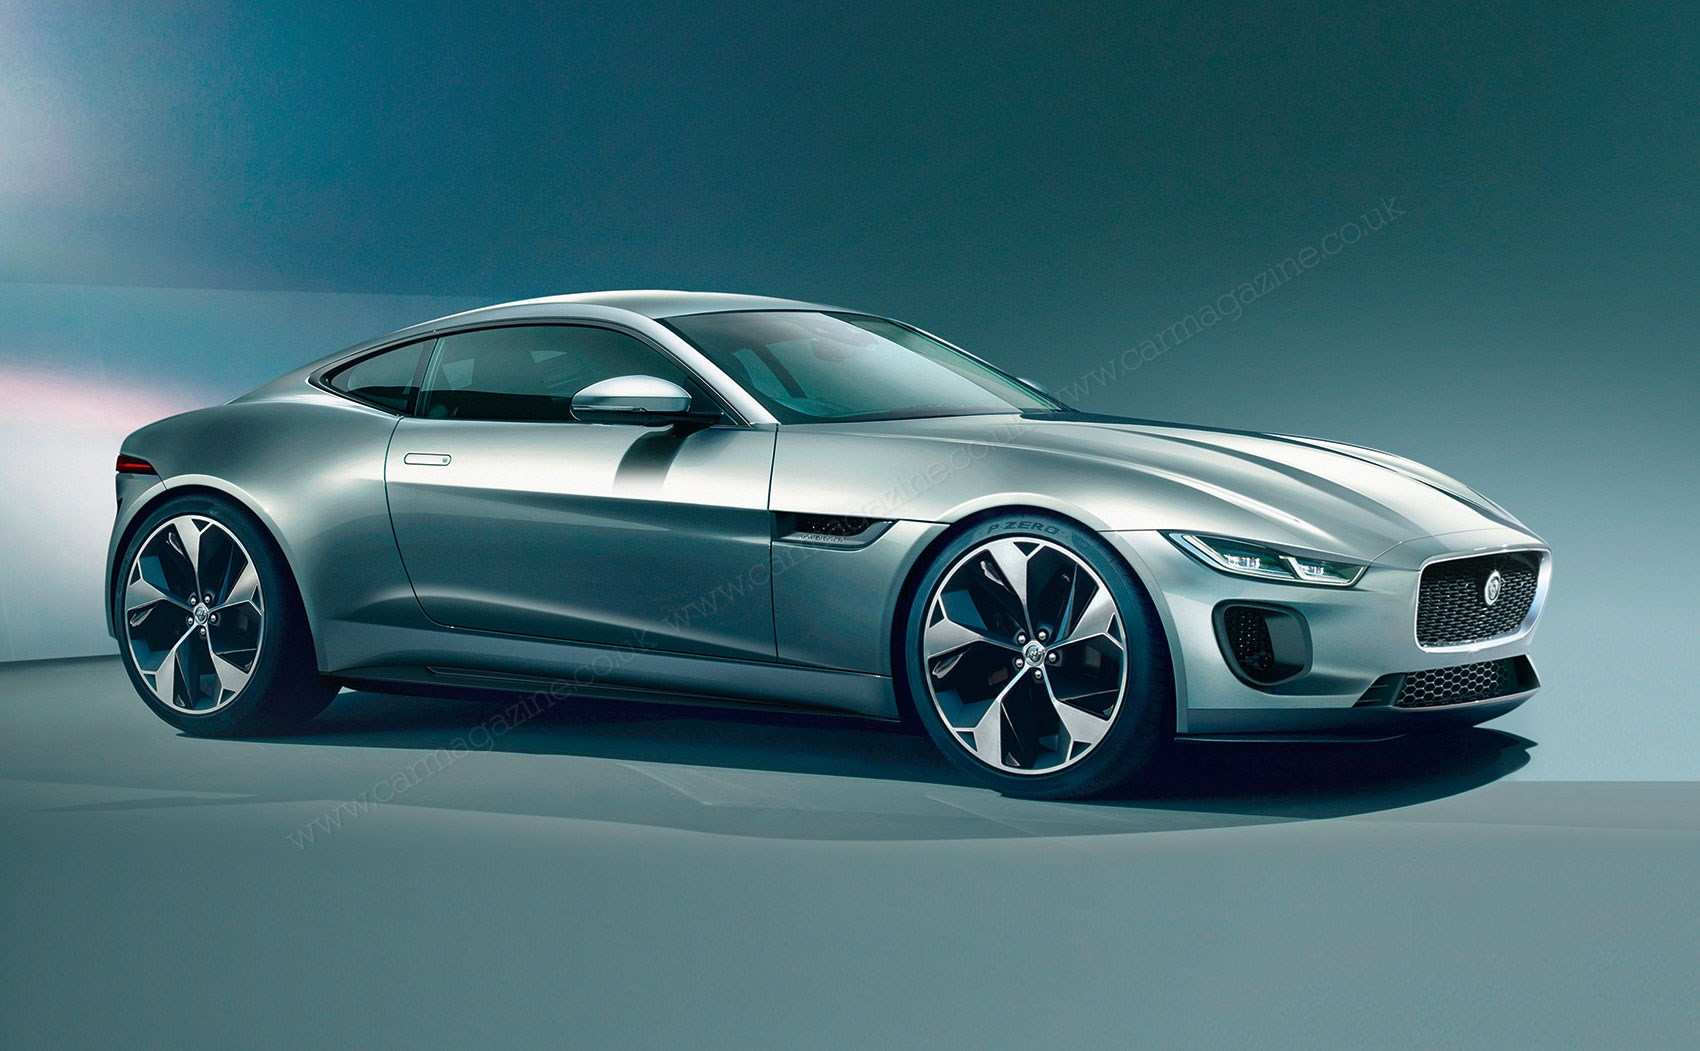 87 New 2020 Jaguar F Type Configurations with 2020 Jaguar F Type